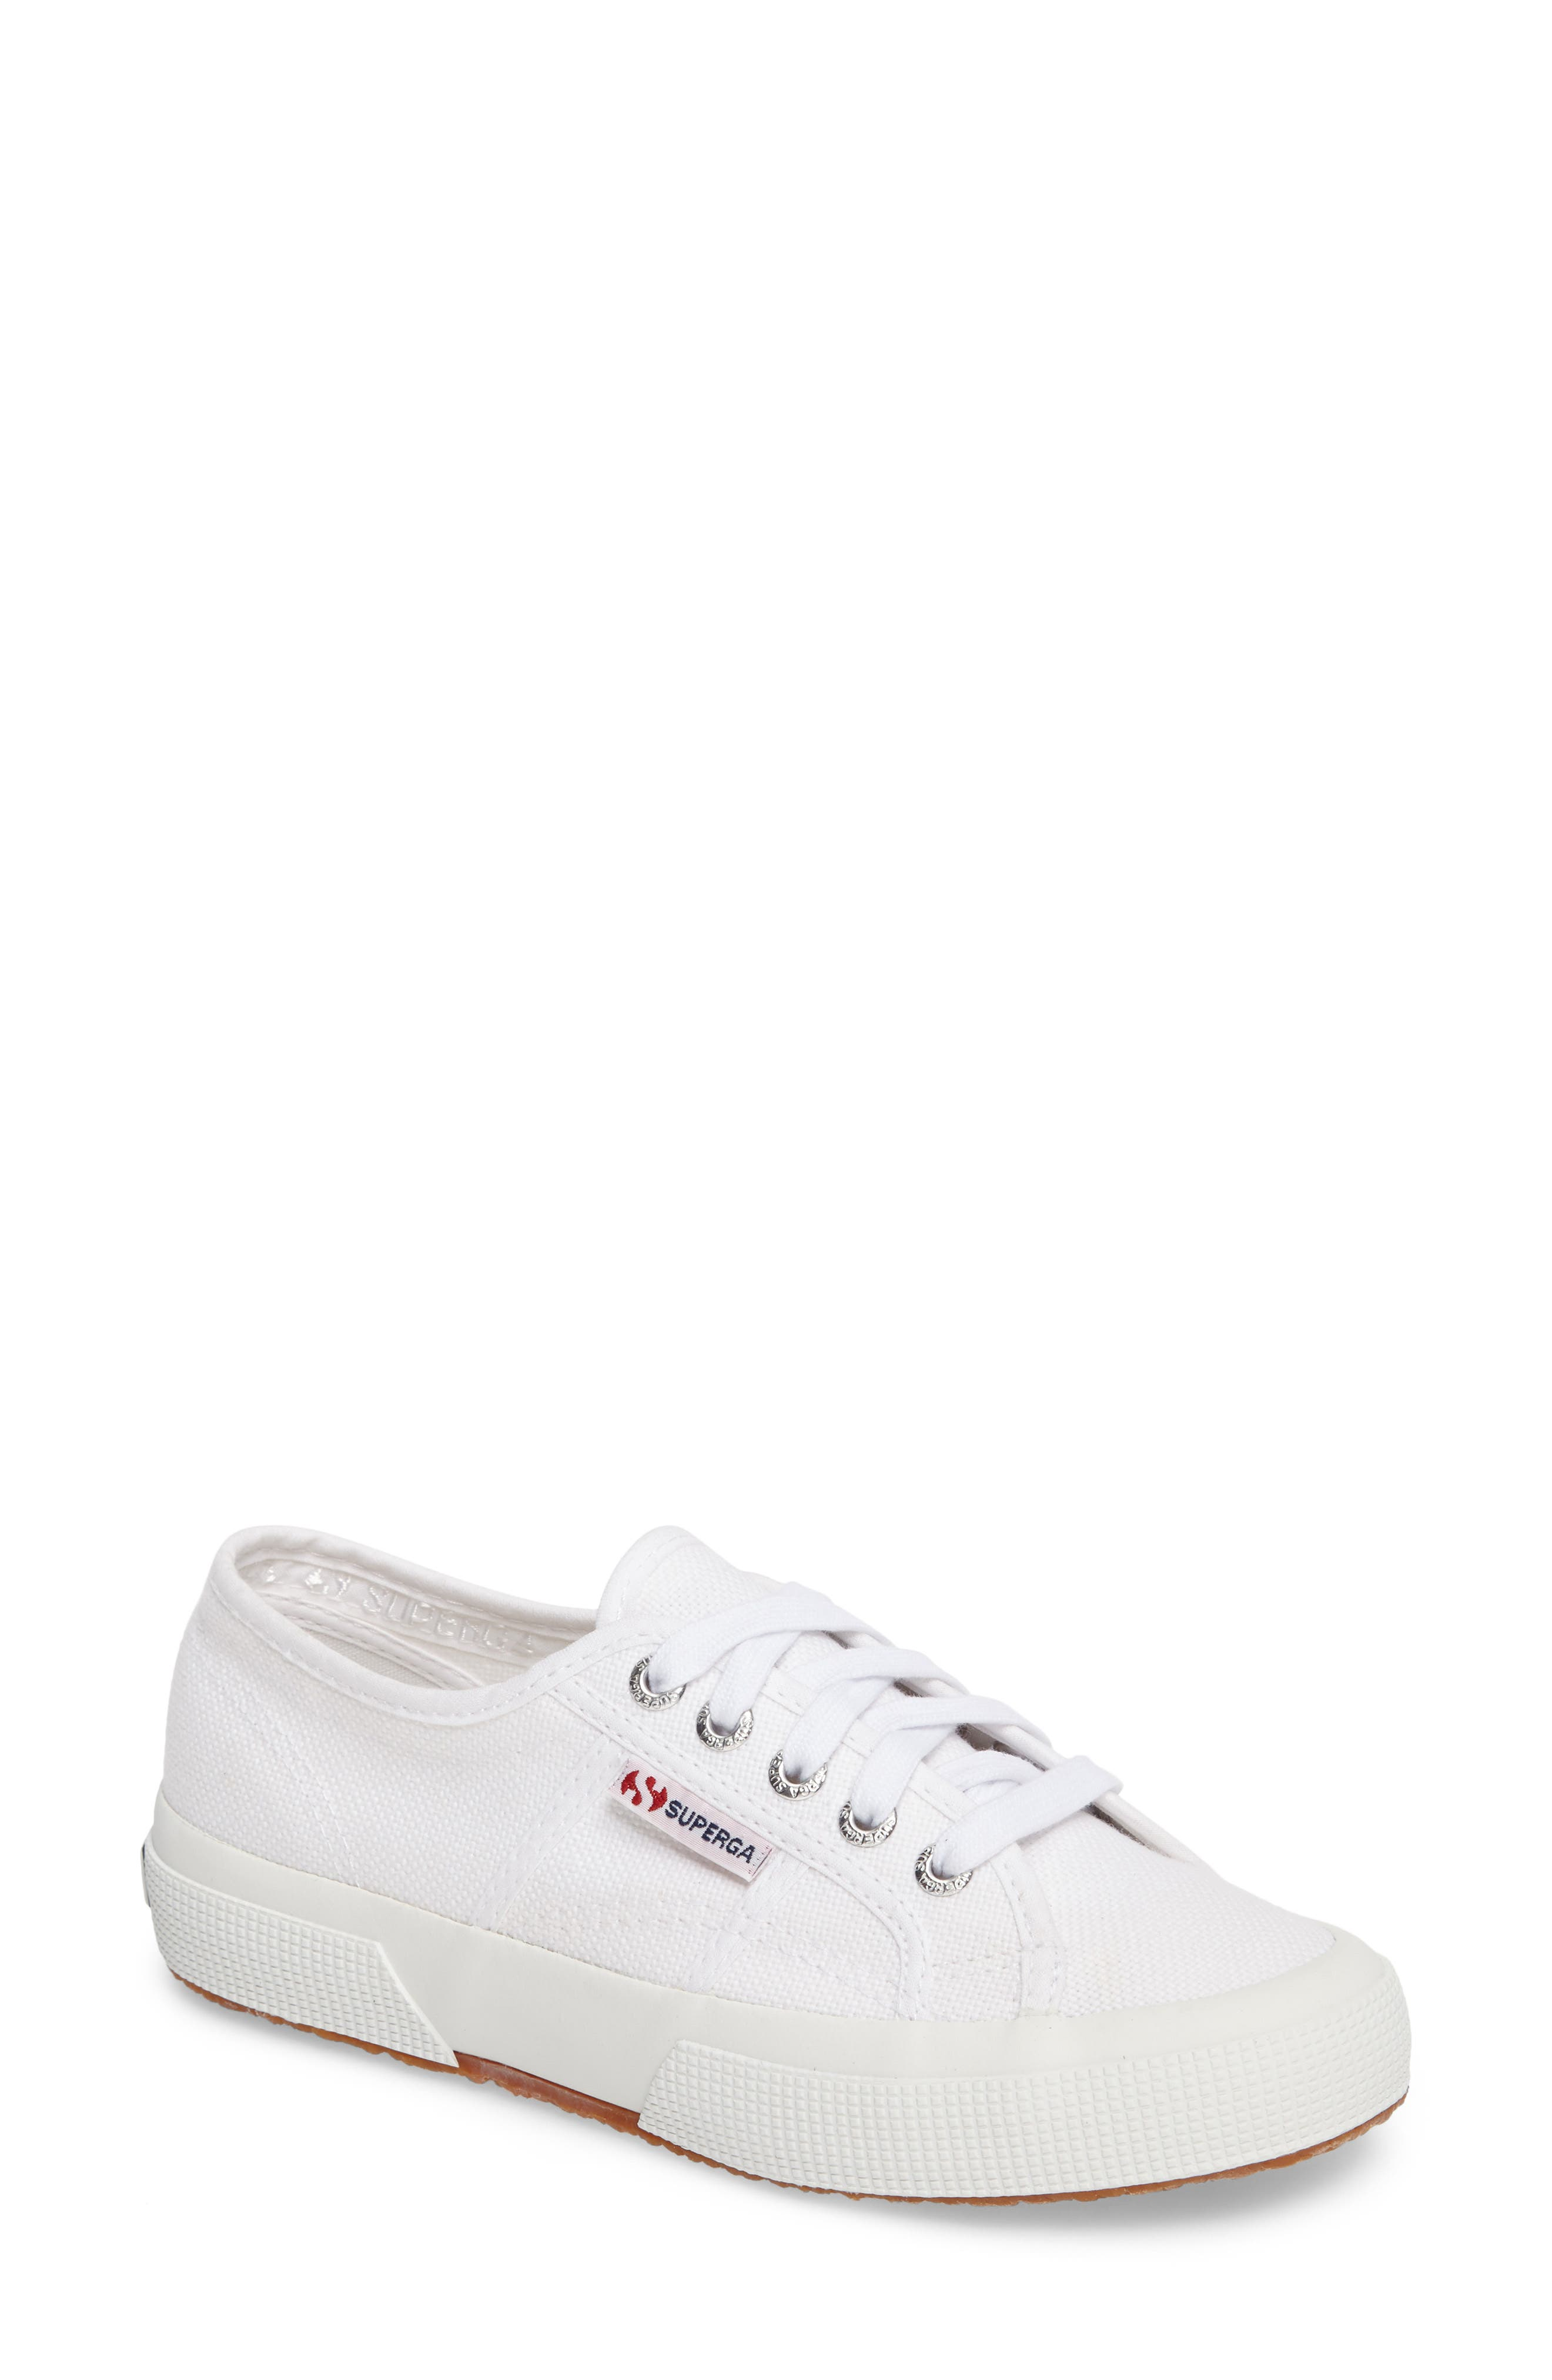 'Cotu' Sneaker, Main, color, WHITE CANVAS